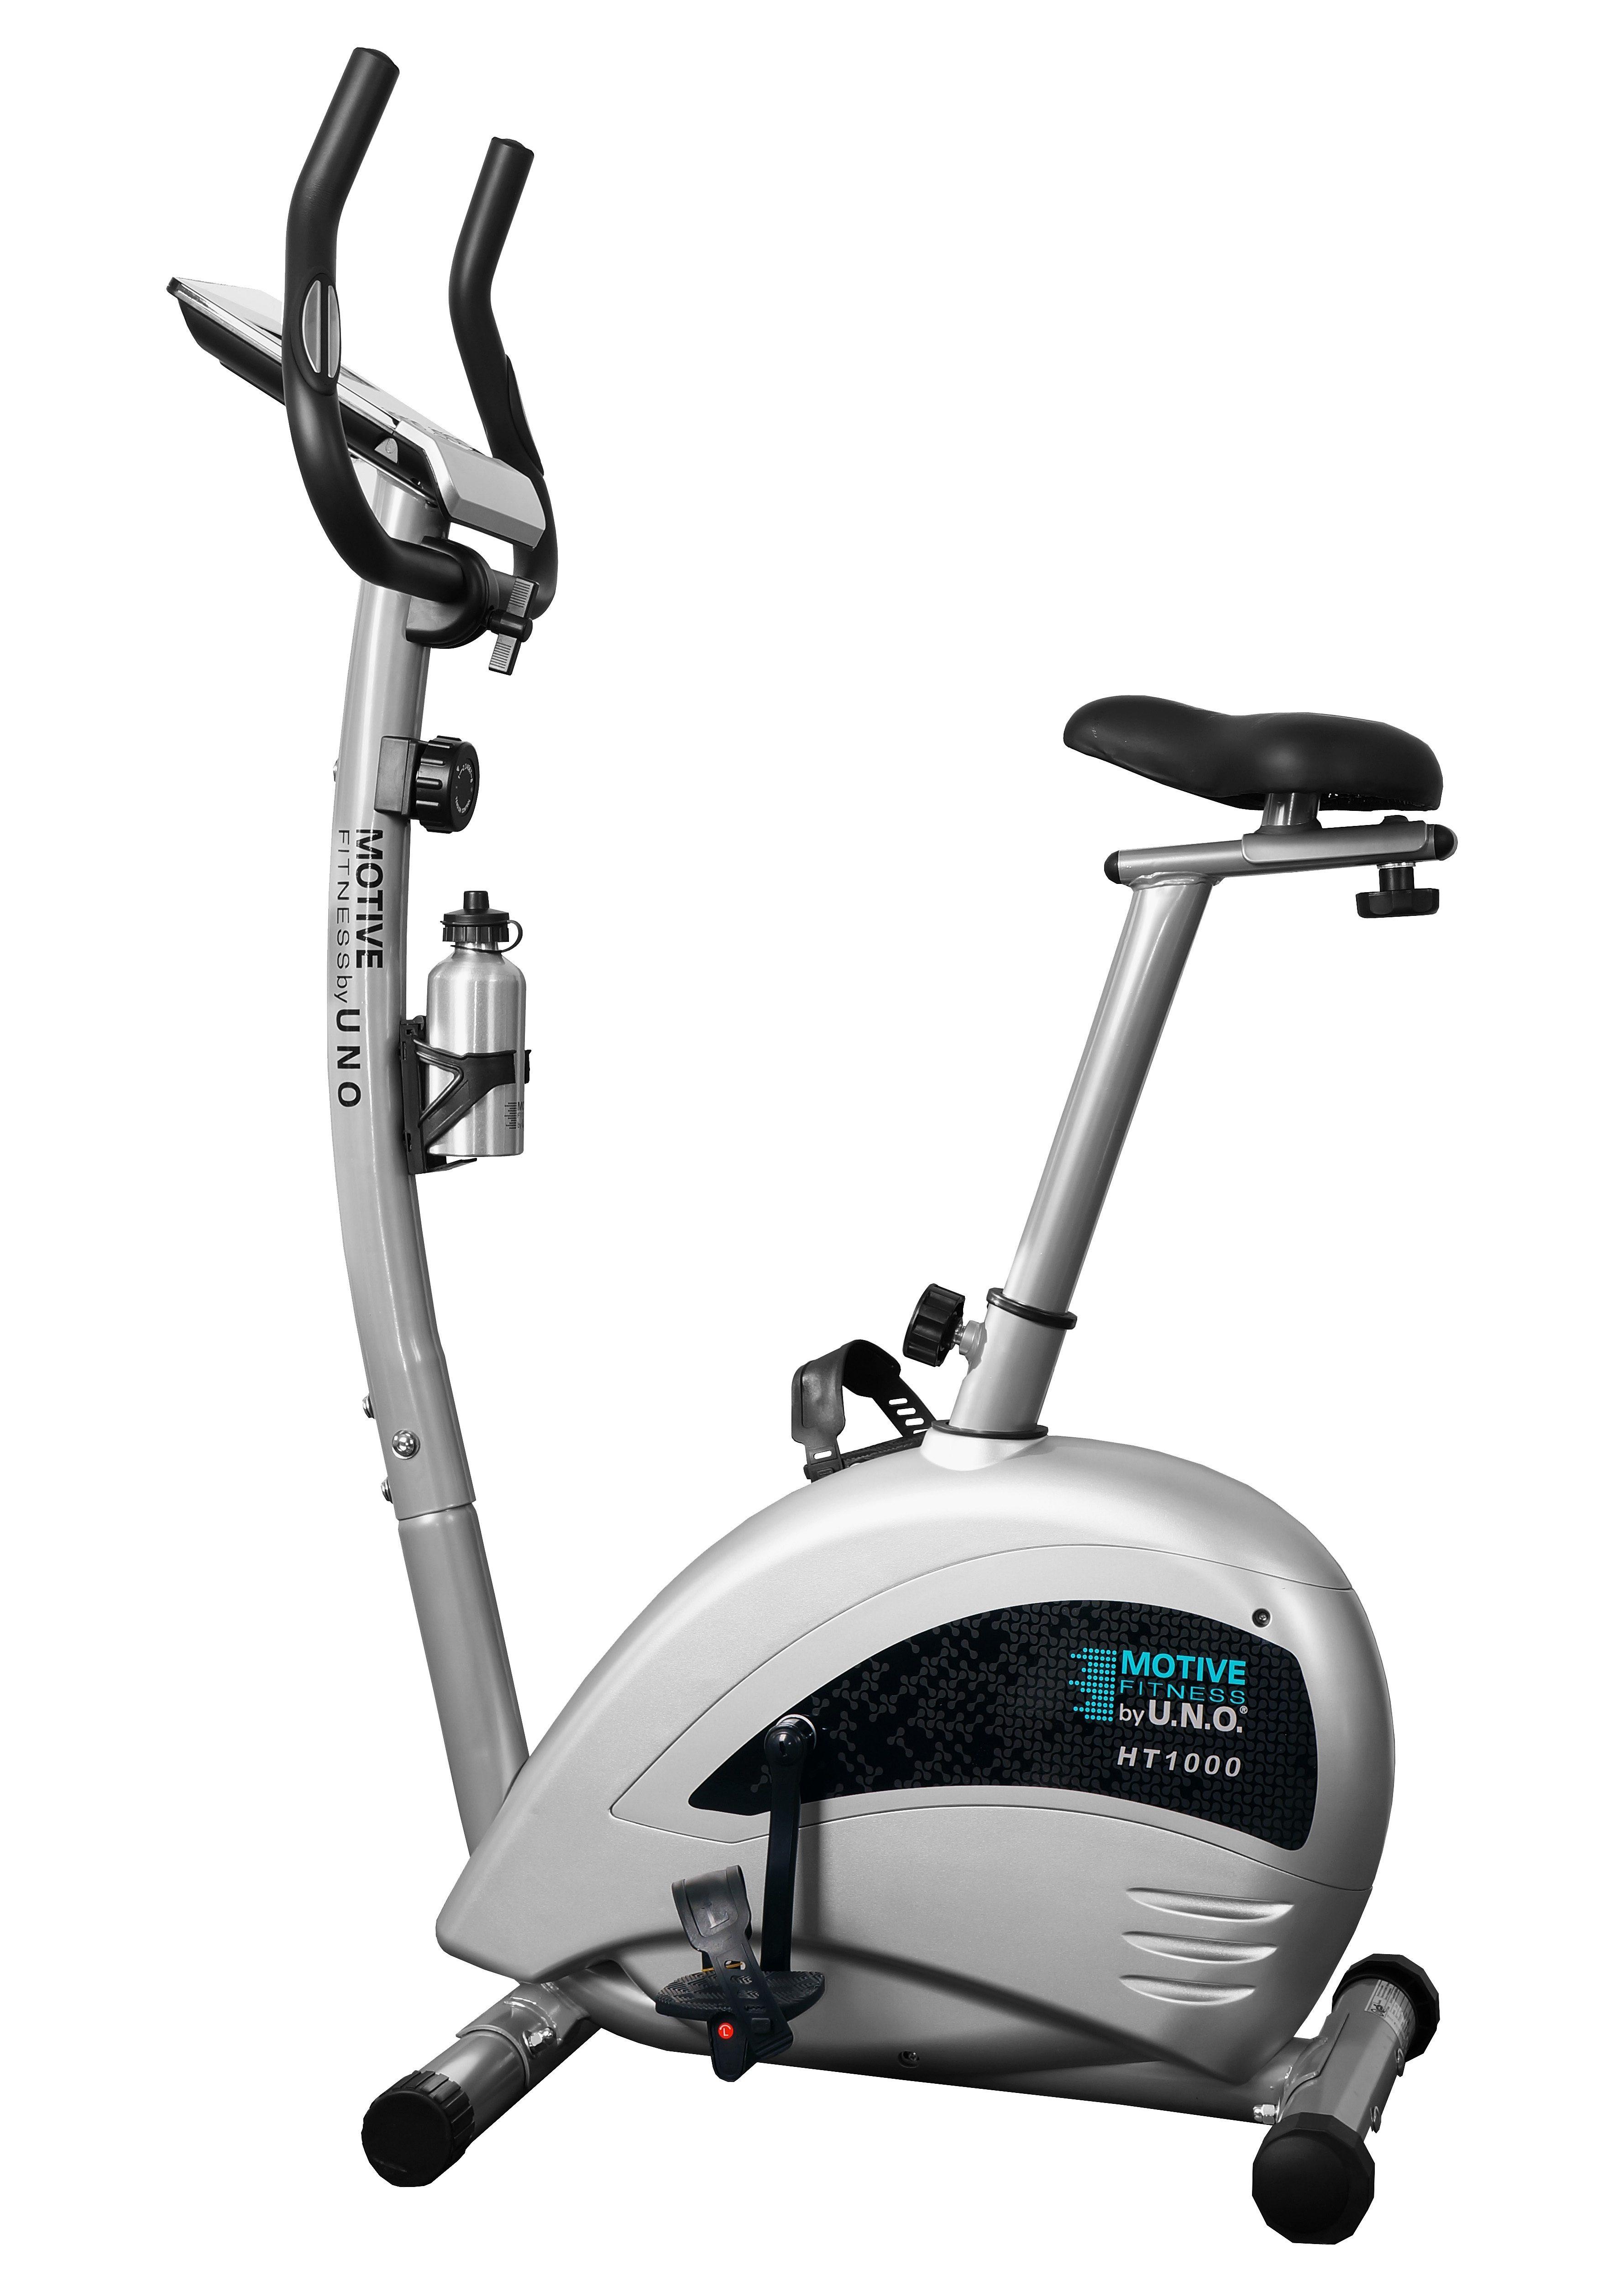 Heimtrainer, »HT 1000«, MOTIVE by U.N.O. Fitness